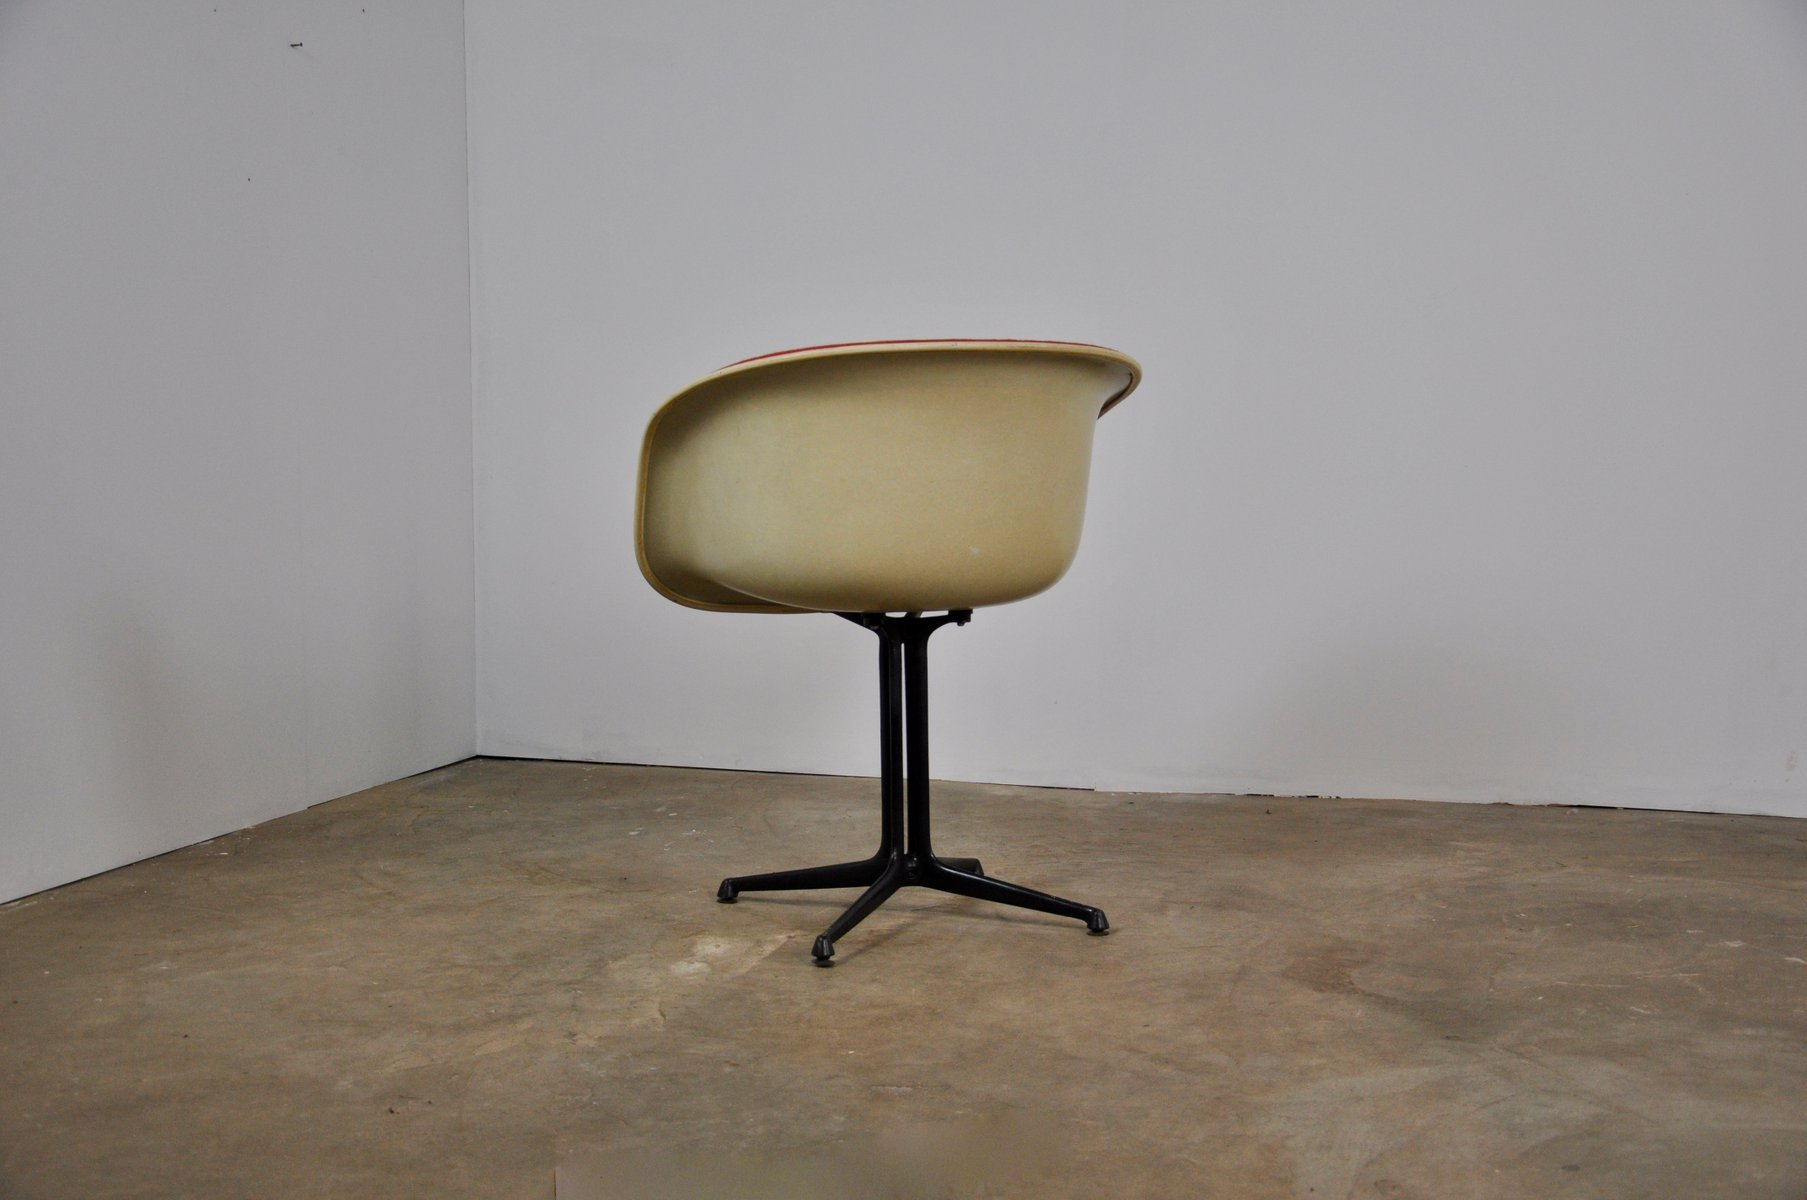 la fonda shell stuhl von charles ray eames f r herman miller 1960er bei pamono kaufen. Black Bedroom Furniture Sets. Home Design Ideas